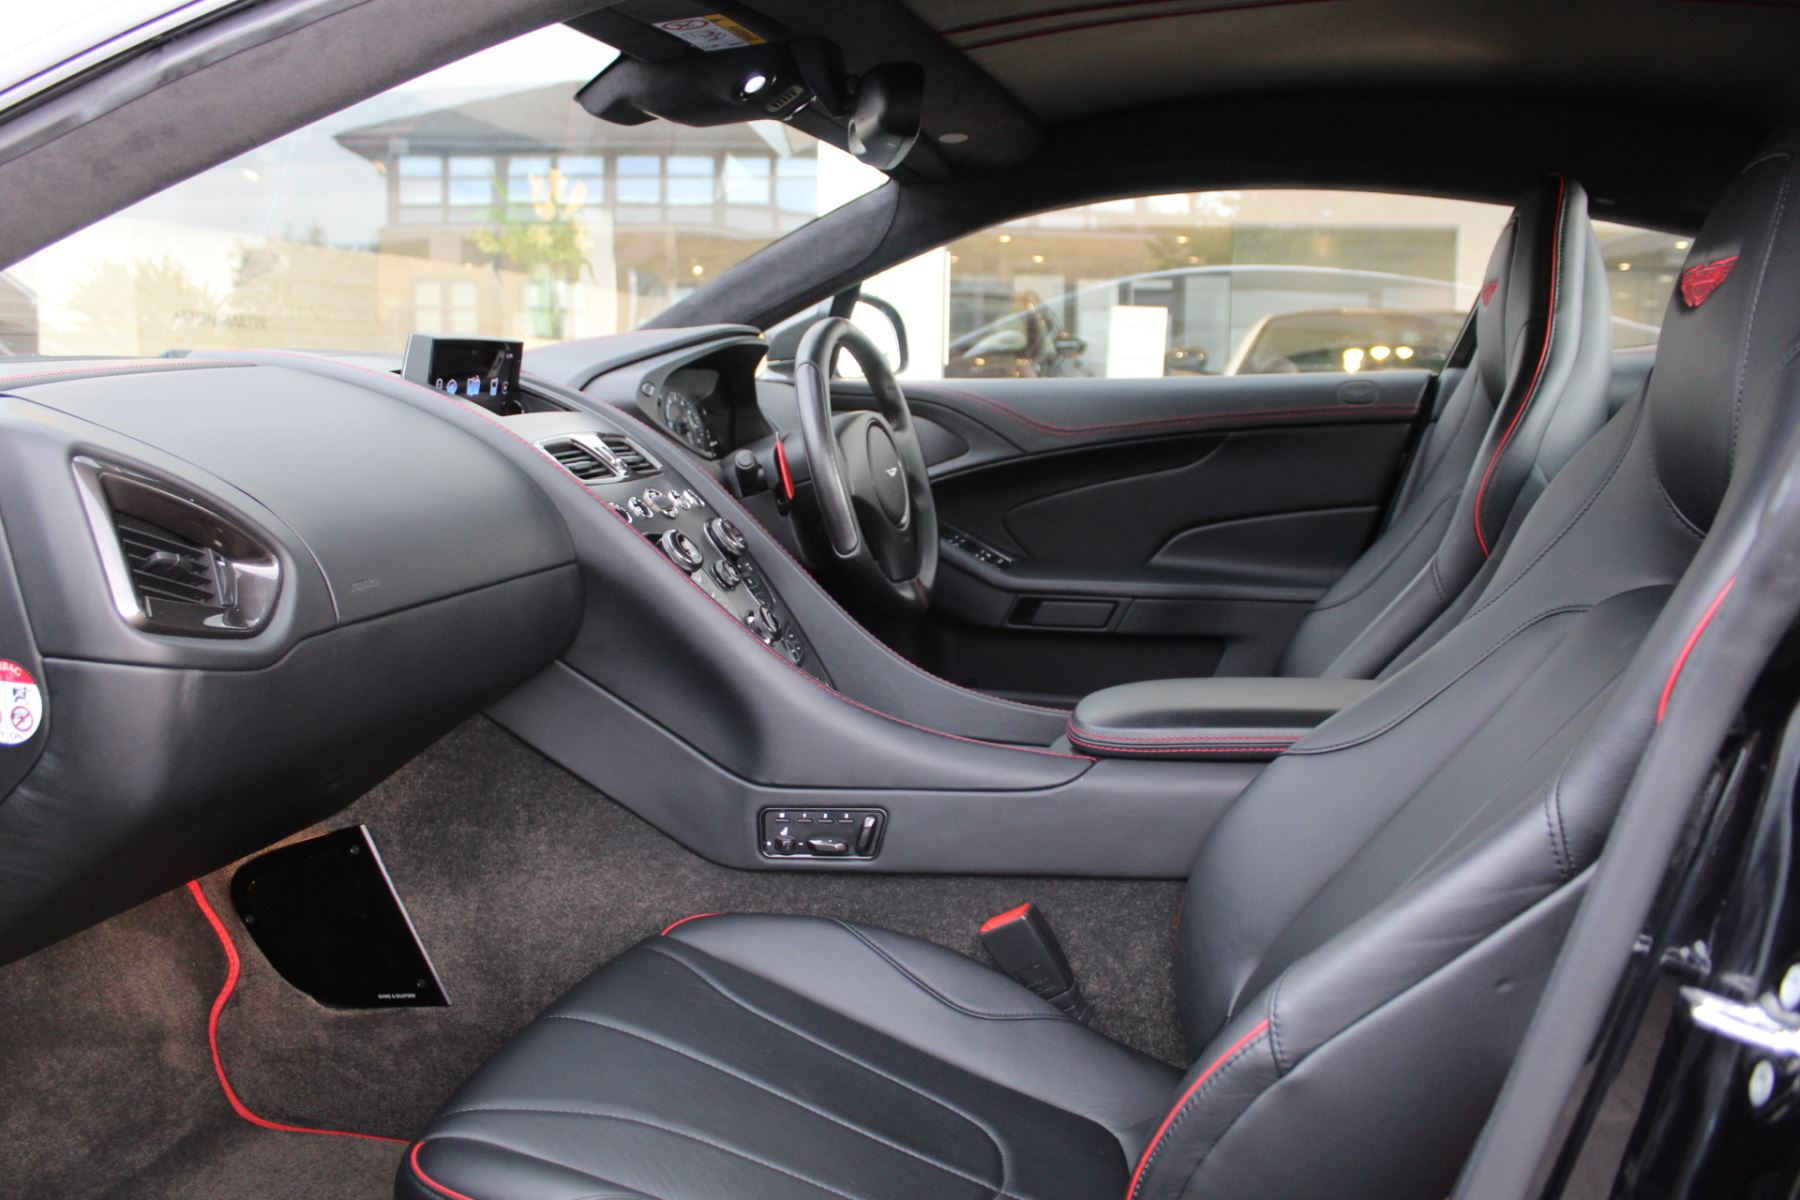 Aston Martin Vanquish V12 [568] 2+2 2dr Touchtronic  Carbon Black Edition  image 3